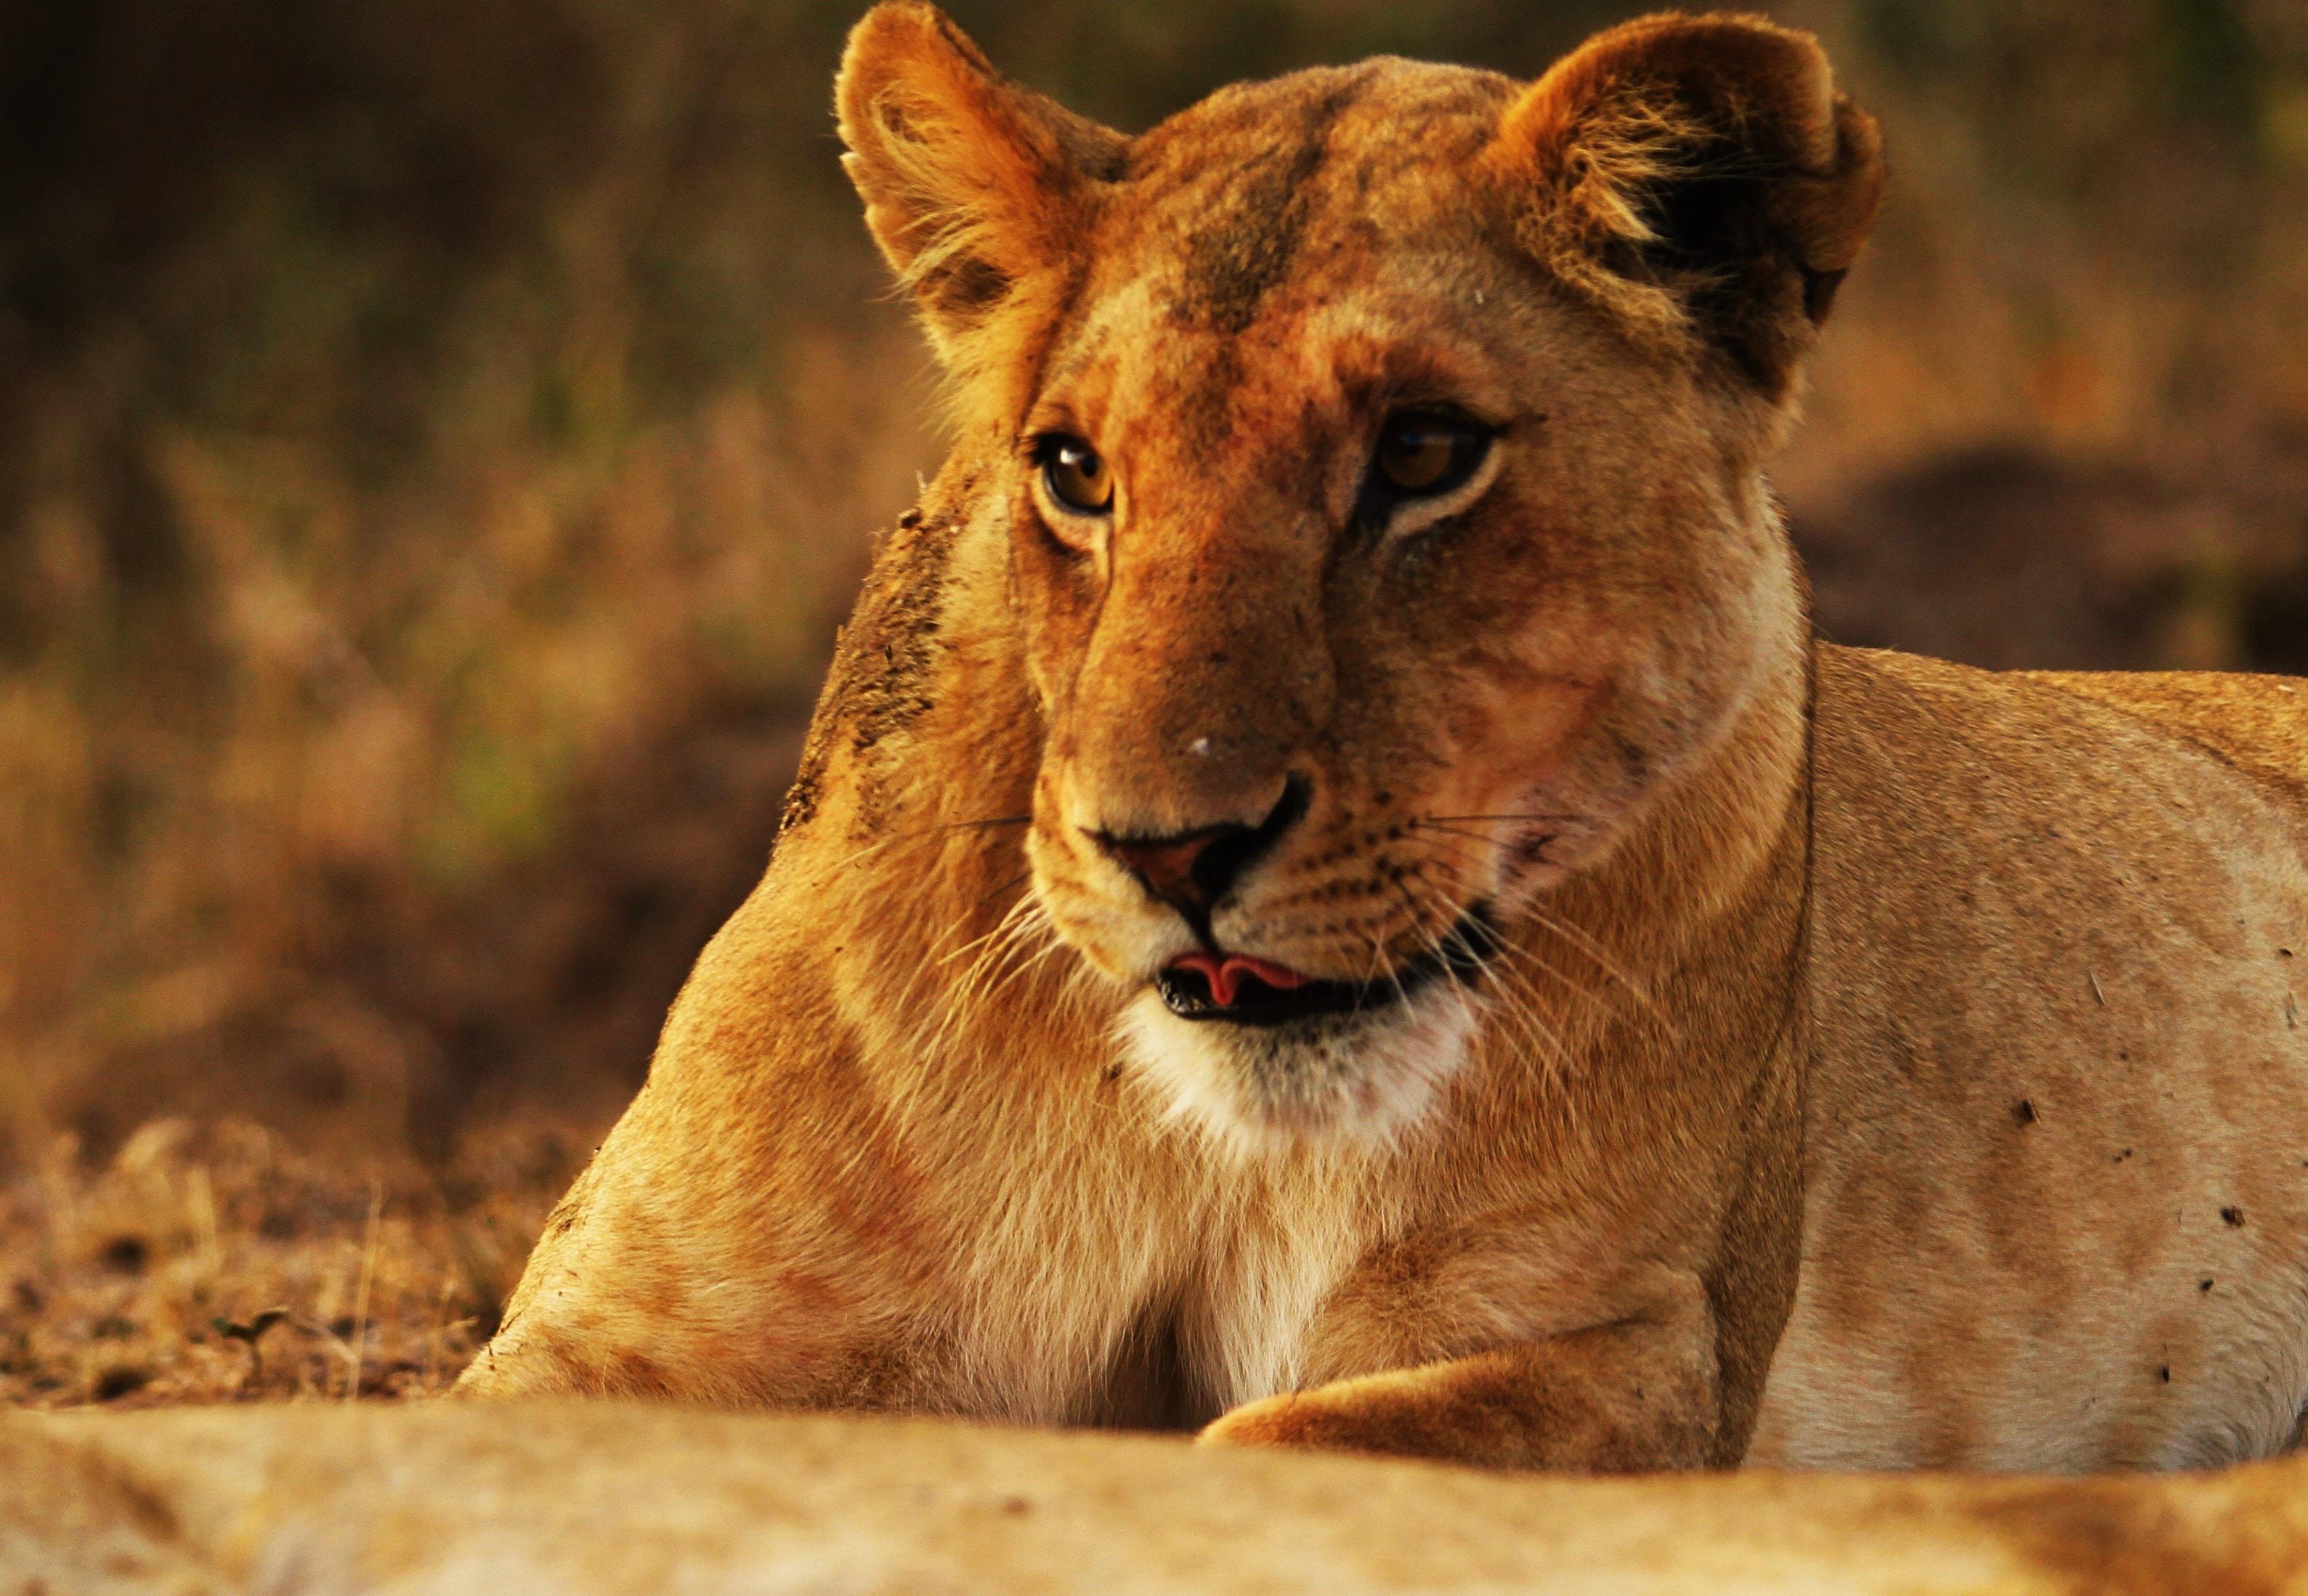 closeup photo of lioness